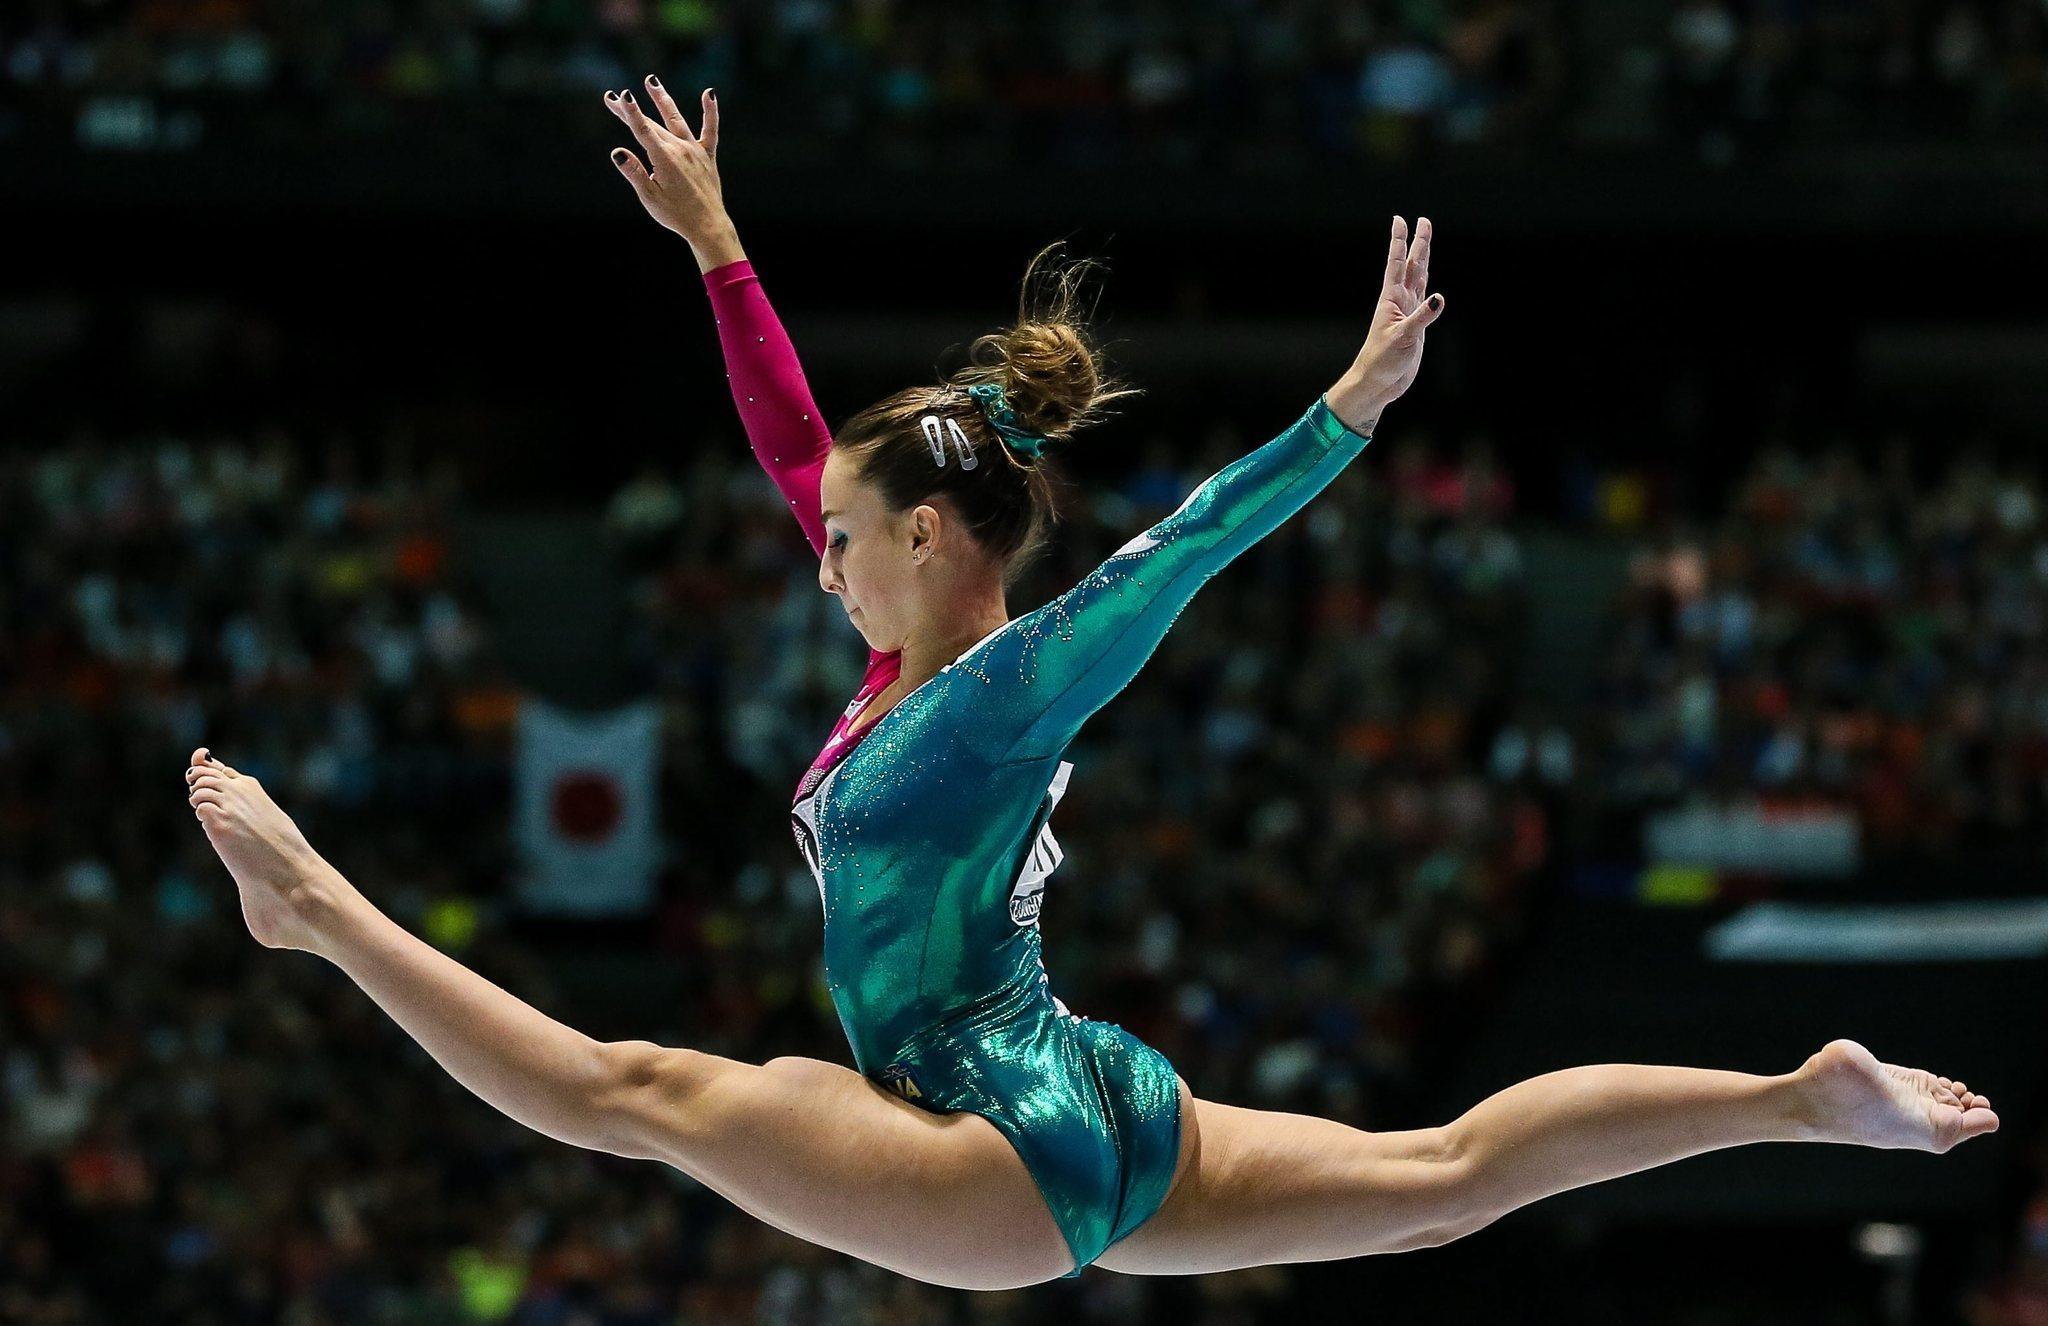 Italian gymnast apologizes for racist remark